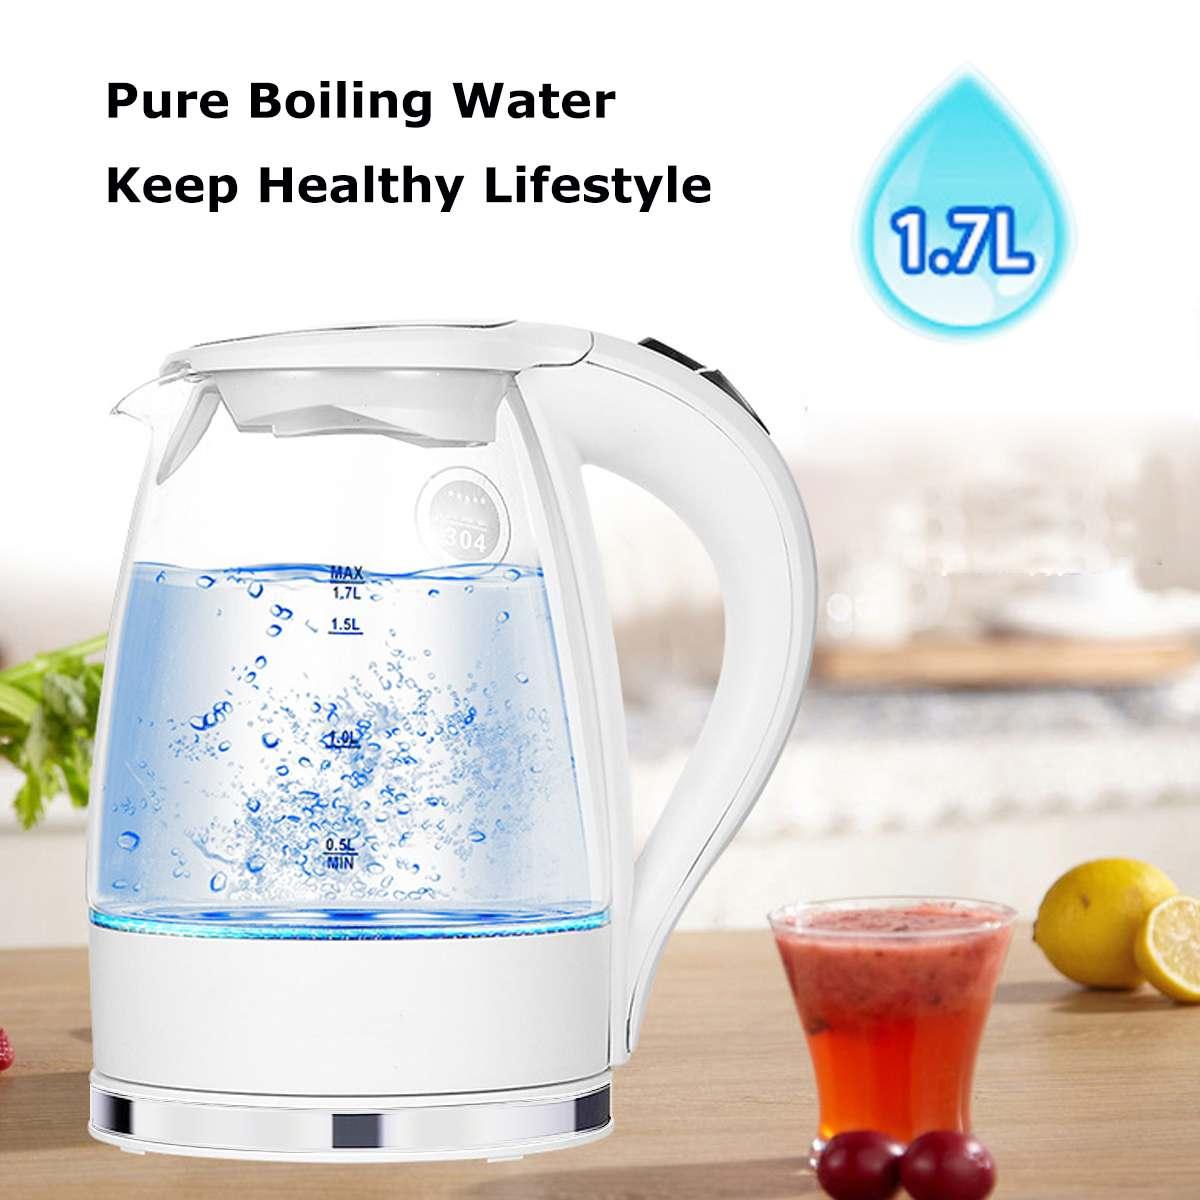 1.7L 2200W Blue LED Illuminated Glass Kettle Electric Rapid Boil Cordless Electric Kettle Electric kettle Teapot Smart Kettle